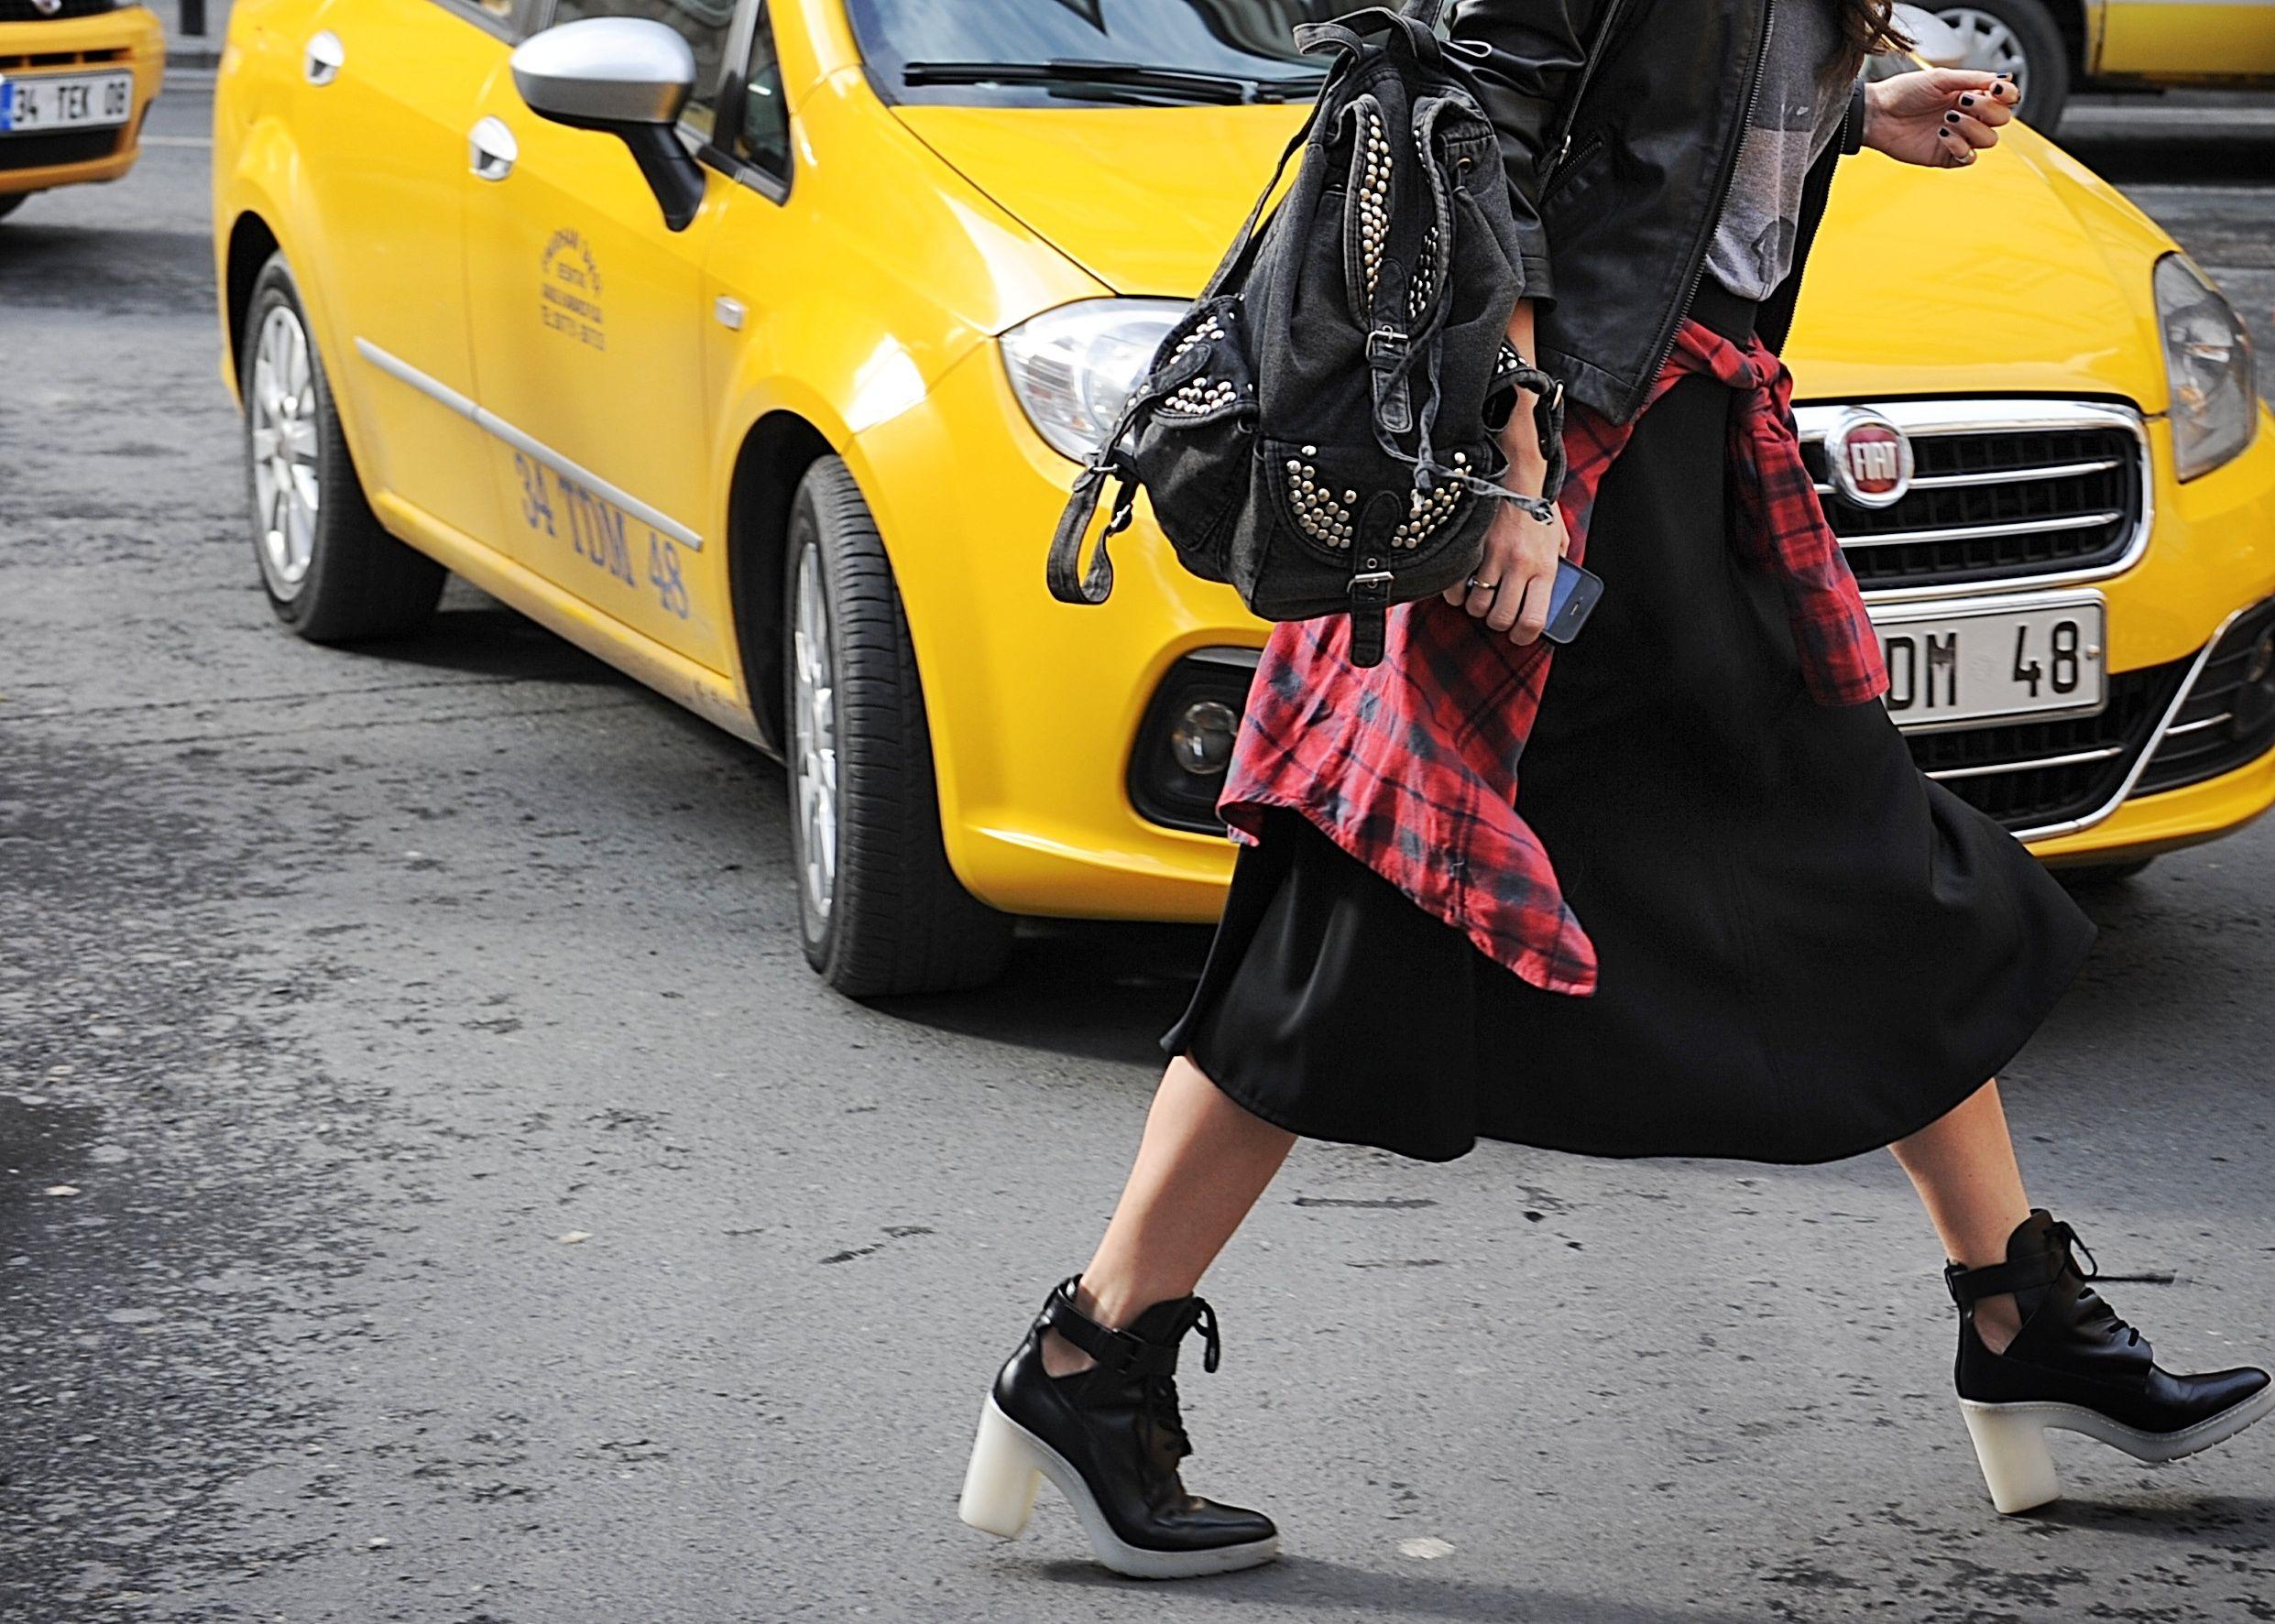 off ne giysem, street style, outfit, uterque, topshop, society6, alexander wang, urban outfitters, my mija, mija,